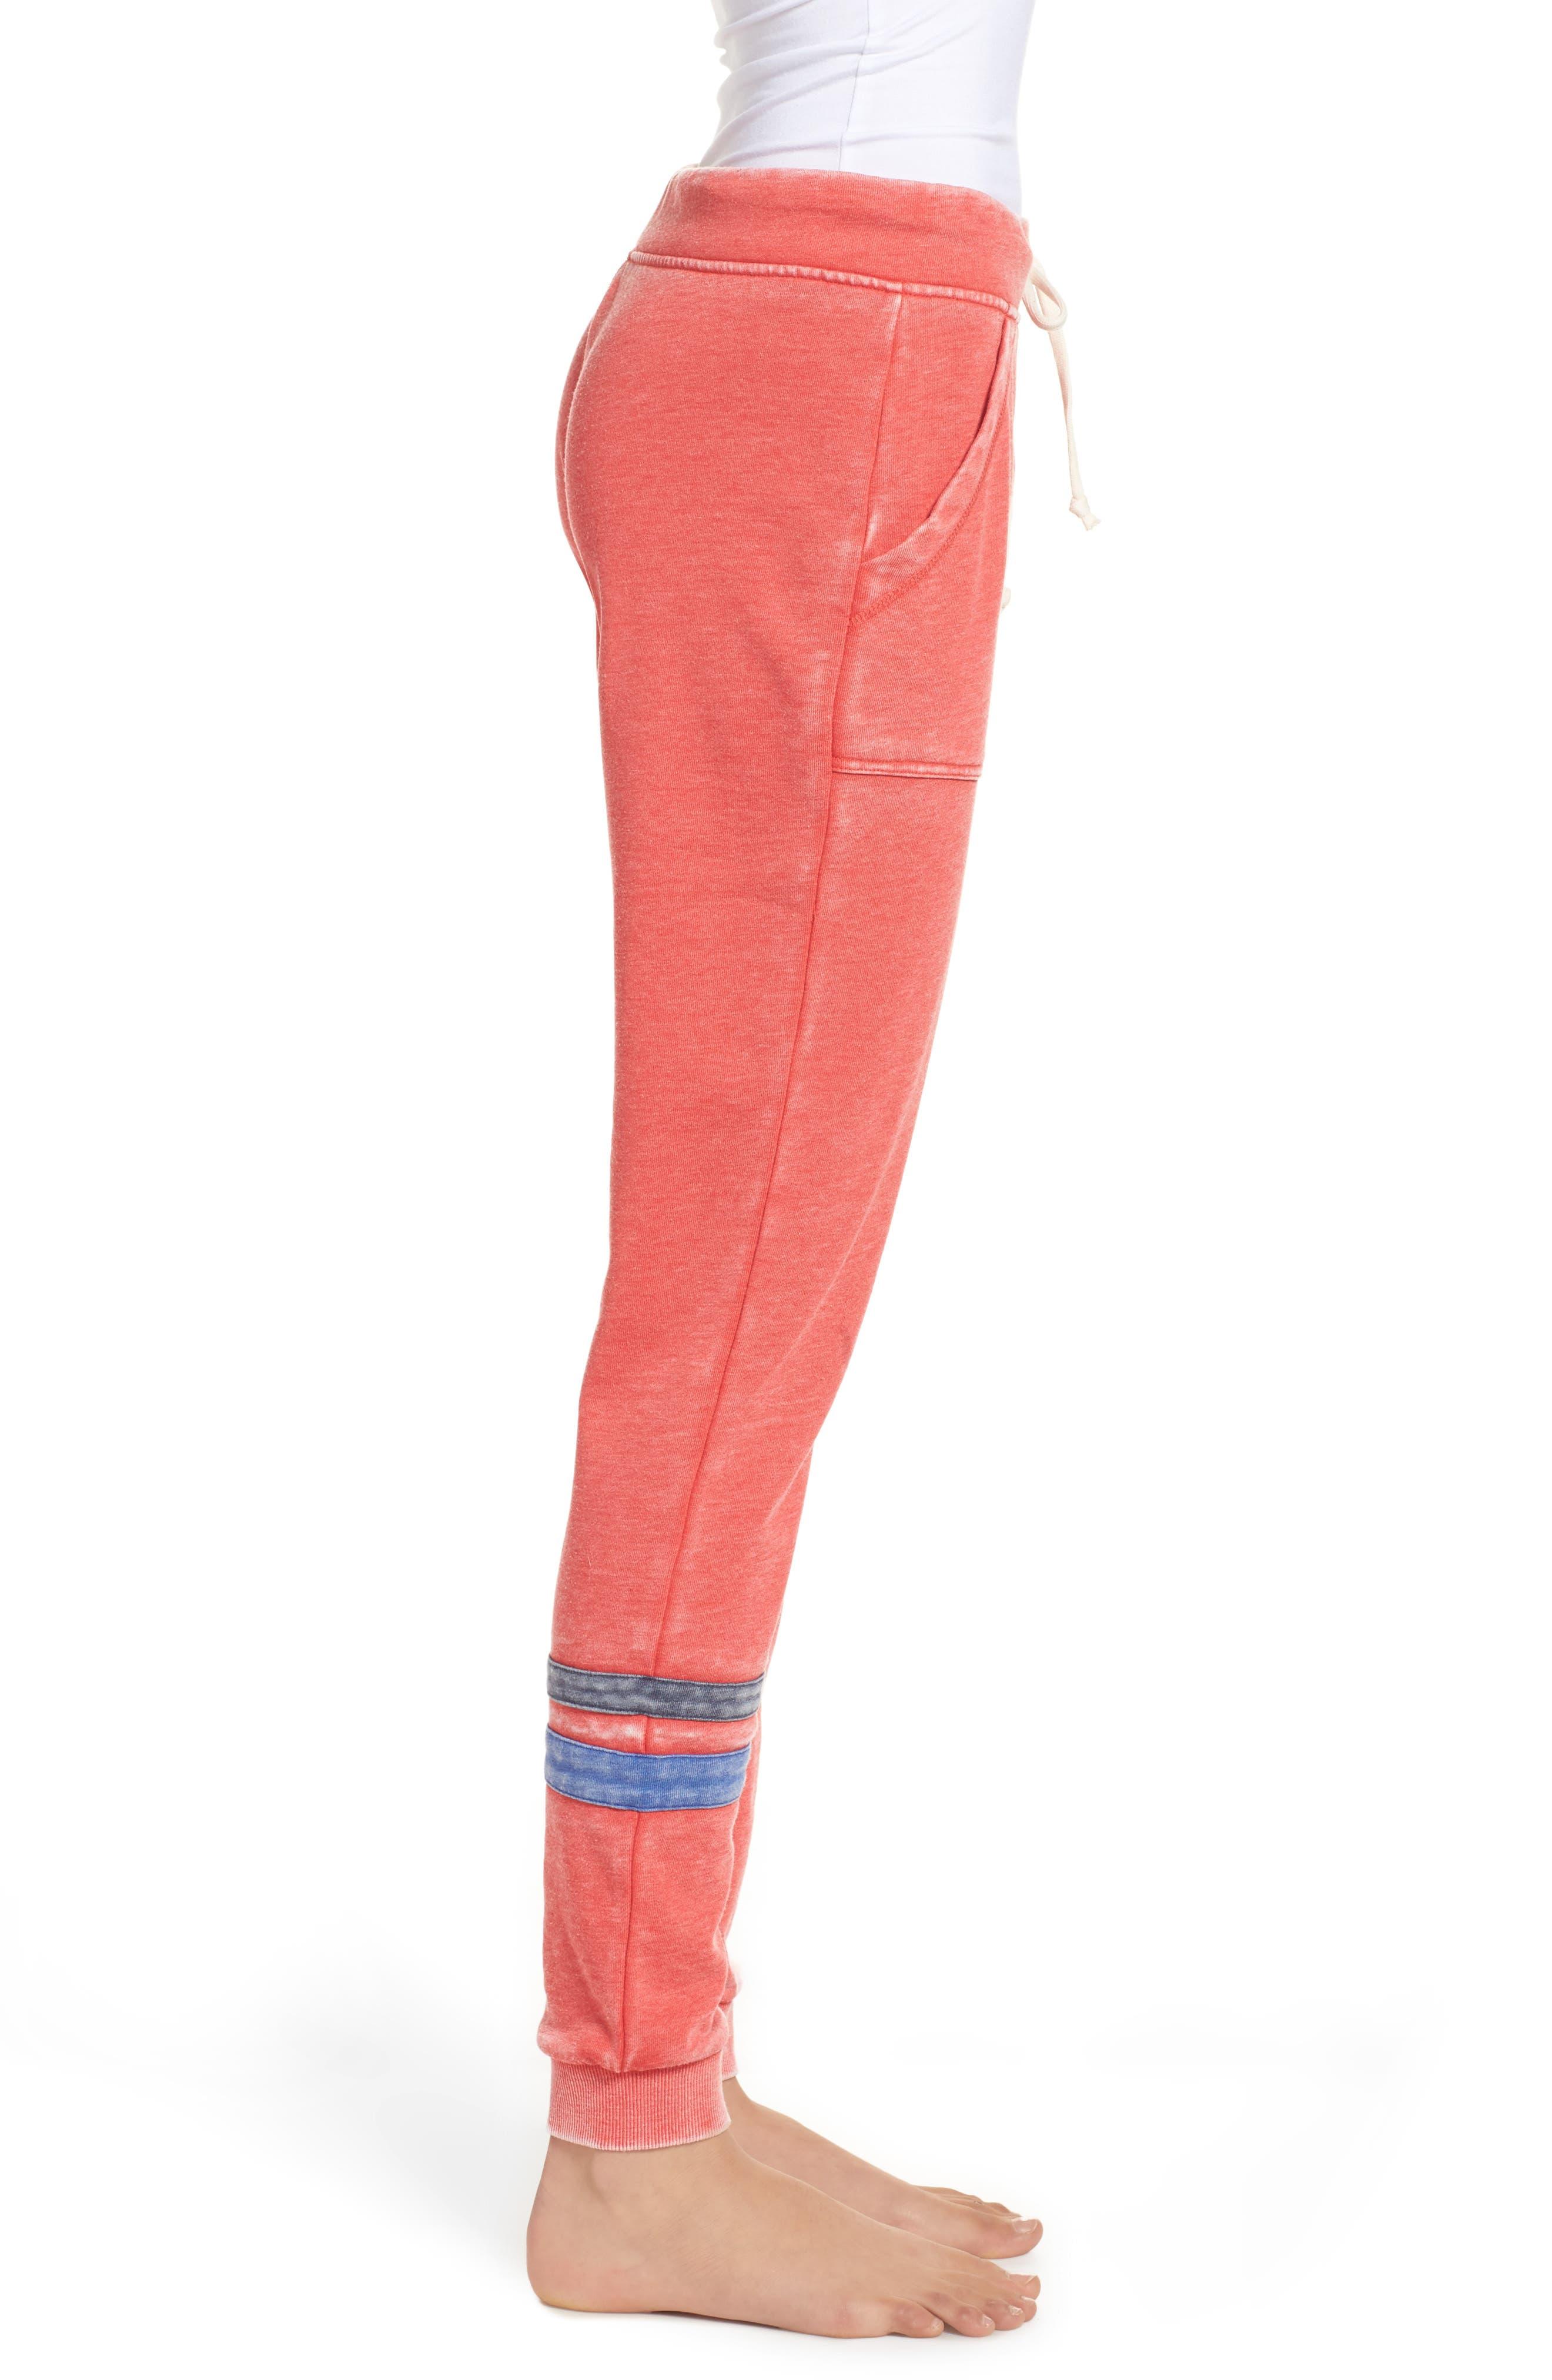 Long Weekend Lounge Jogger Pants,                             Alternate thumbnail 3, color,                             Red Bloom/ Dark Navy/ Blue